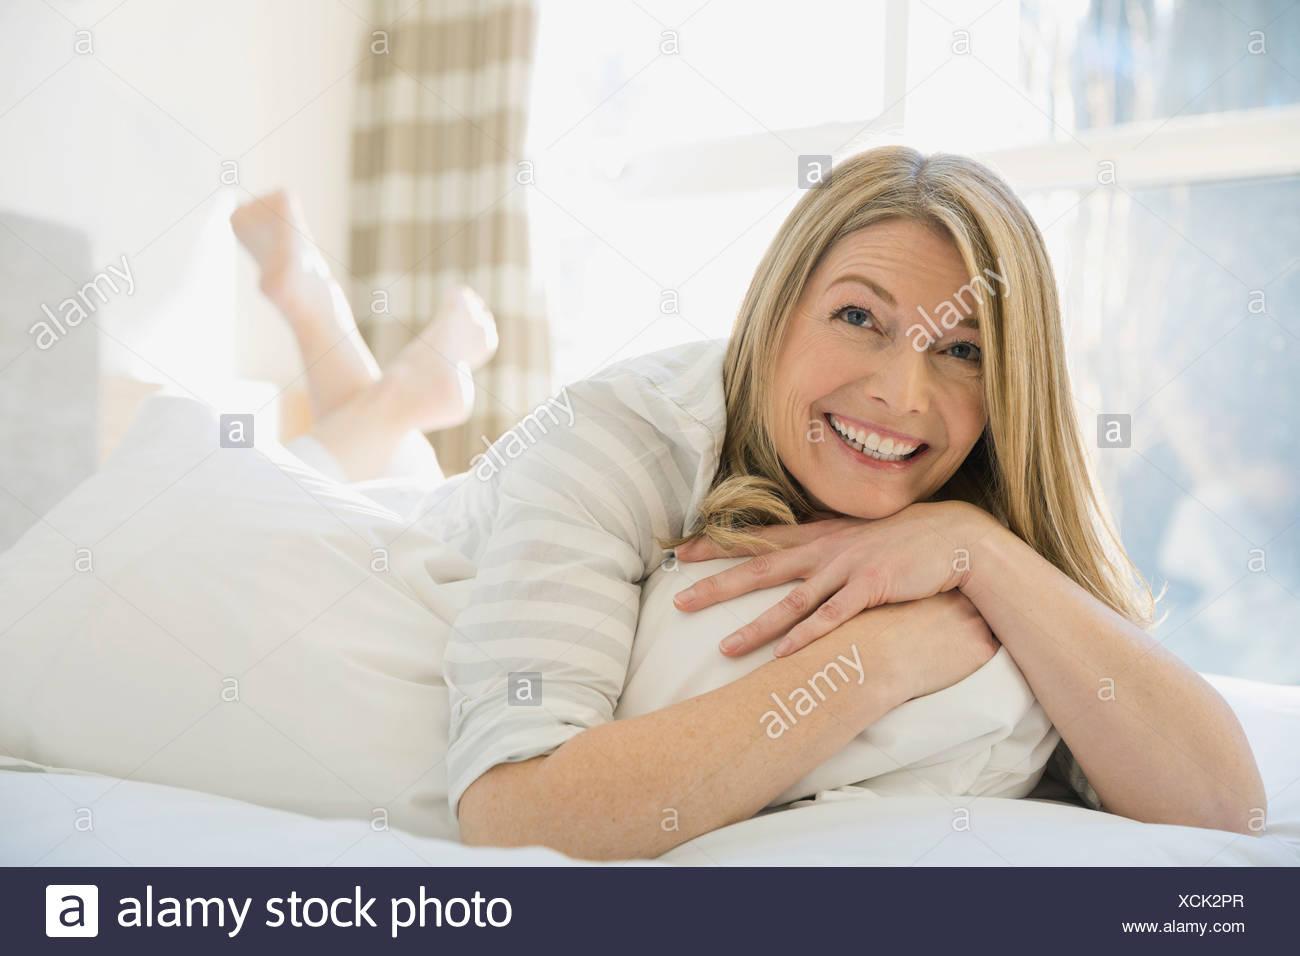 Lächelnde Frau auf Bett Stockbild